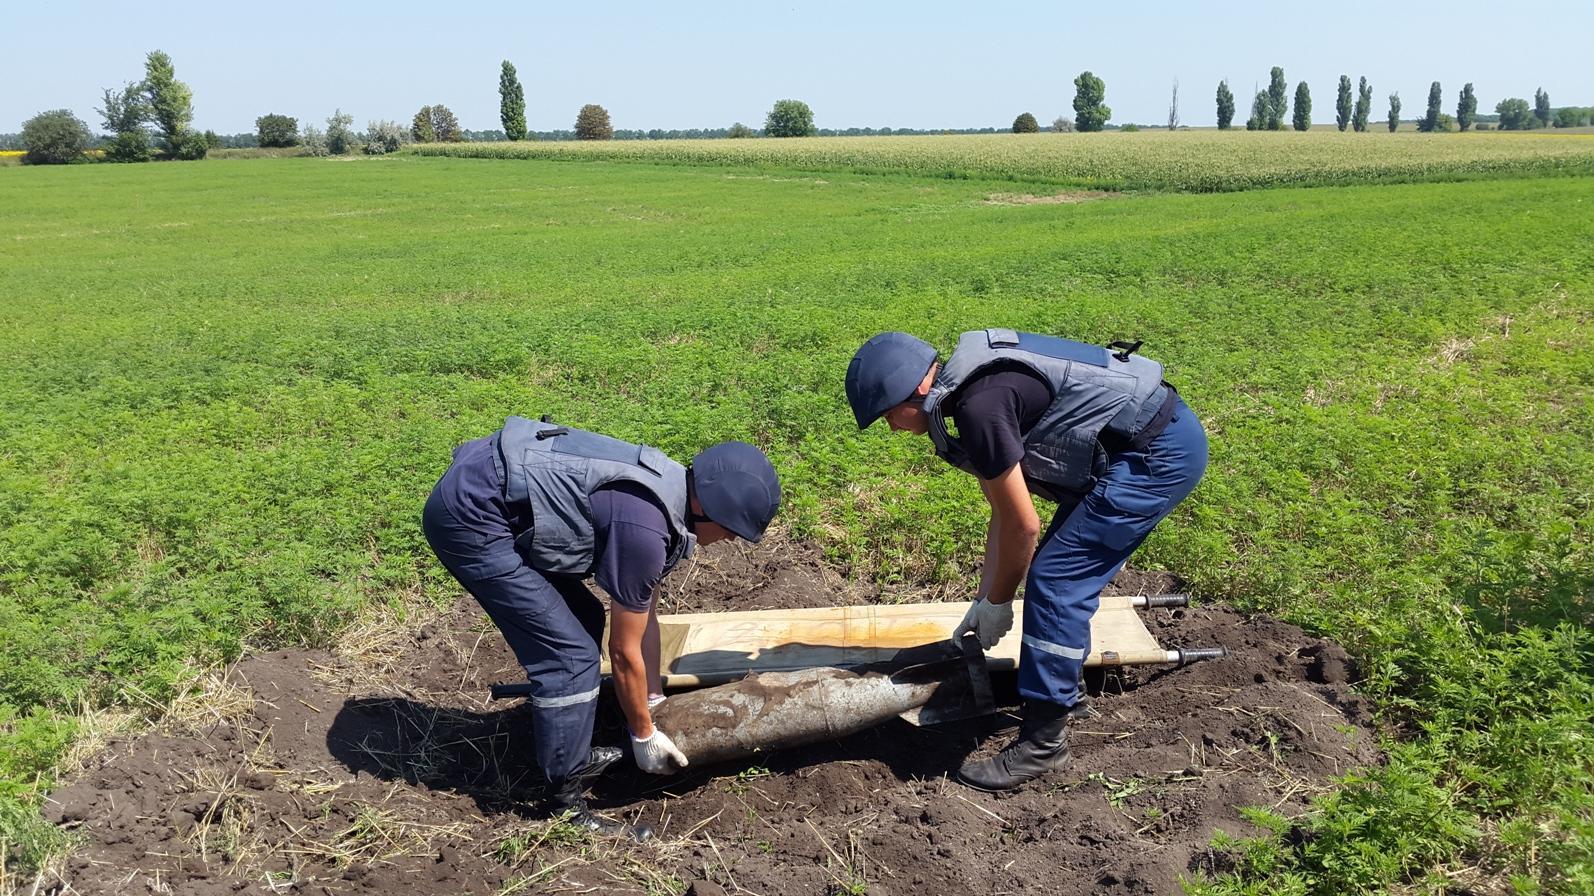 Обезвреживание боеприпасов сотрудниками ГСЧС